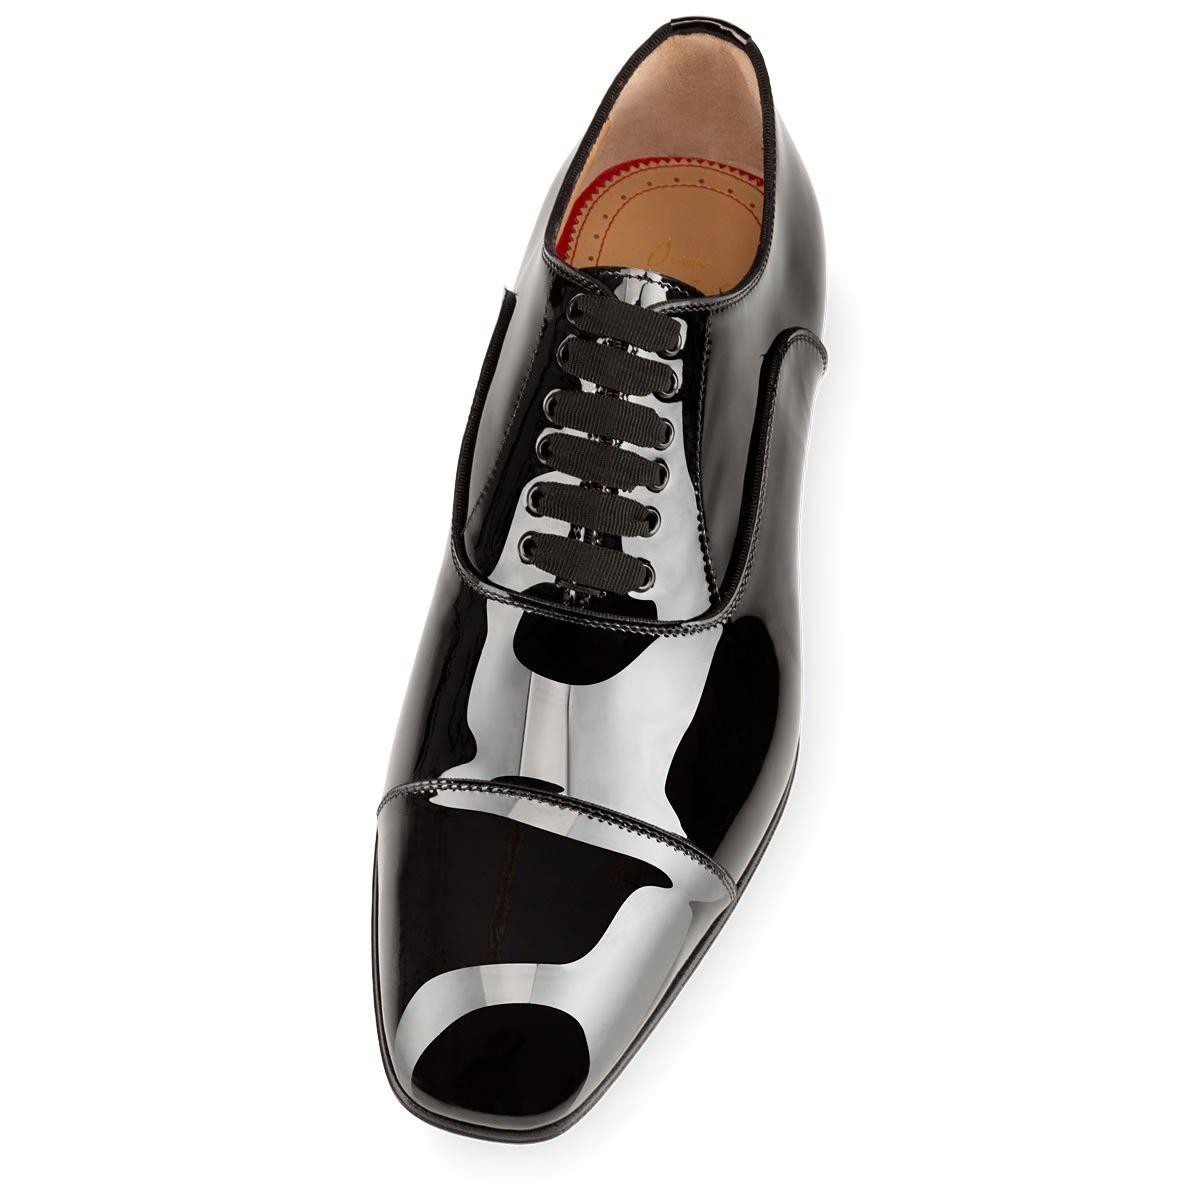 GREGGO FLAT Black Patent Leather - Men